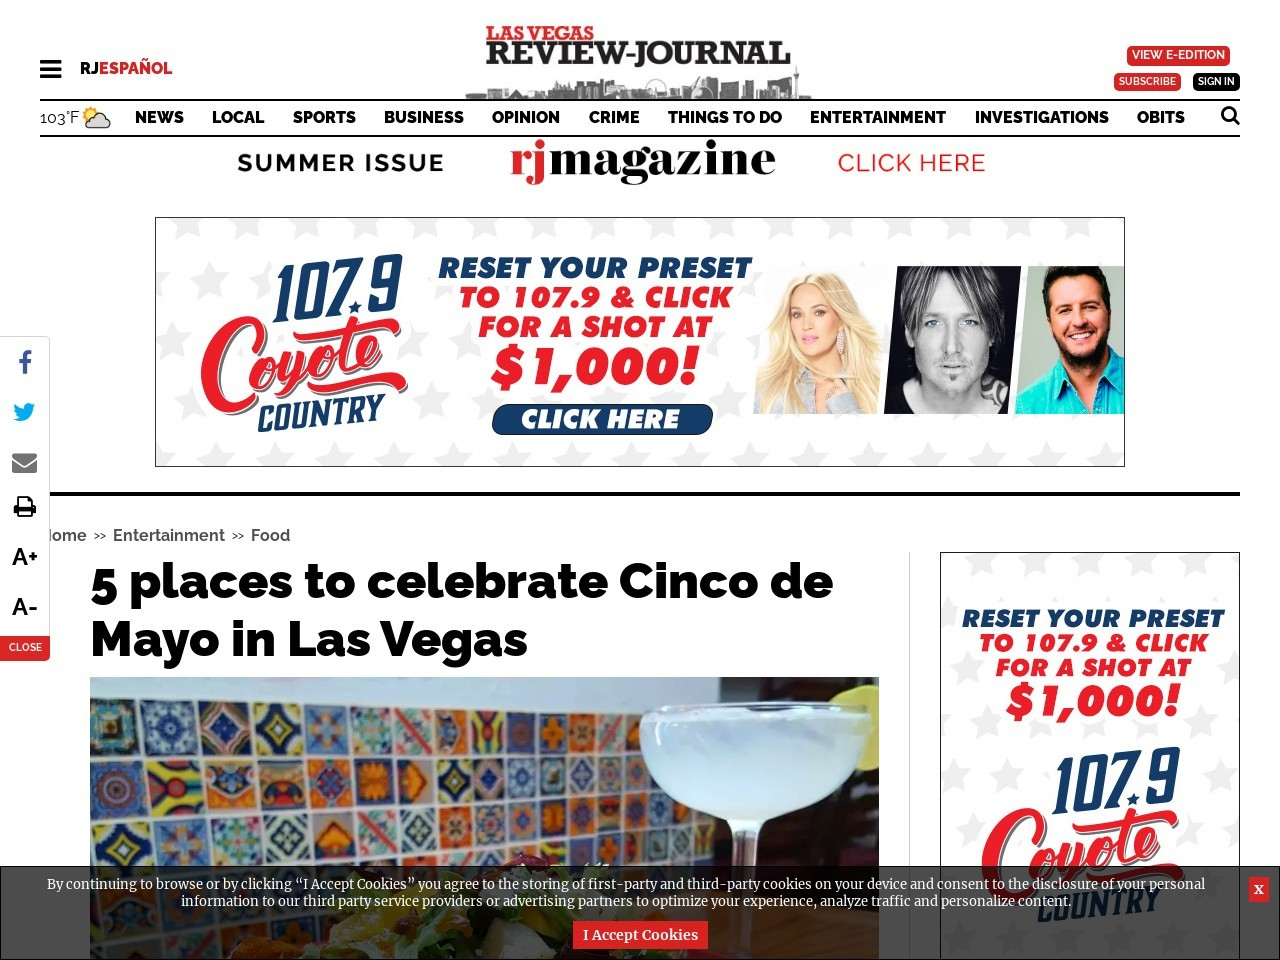 5 places to celebrate Cinco de Mayo in Las Vegas